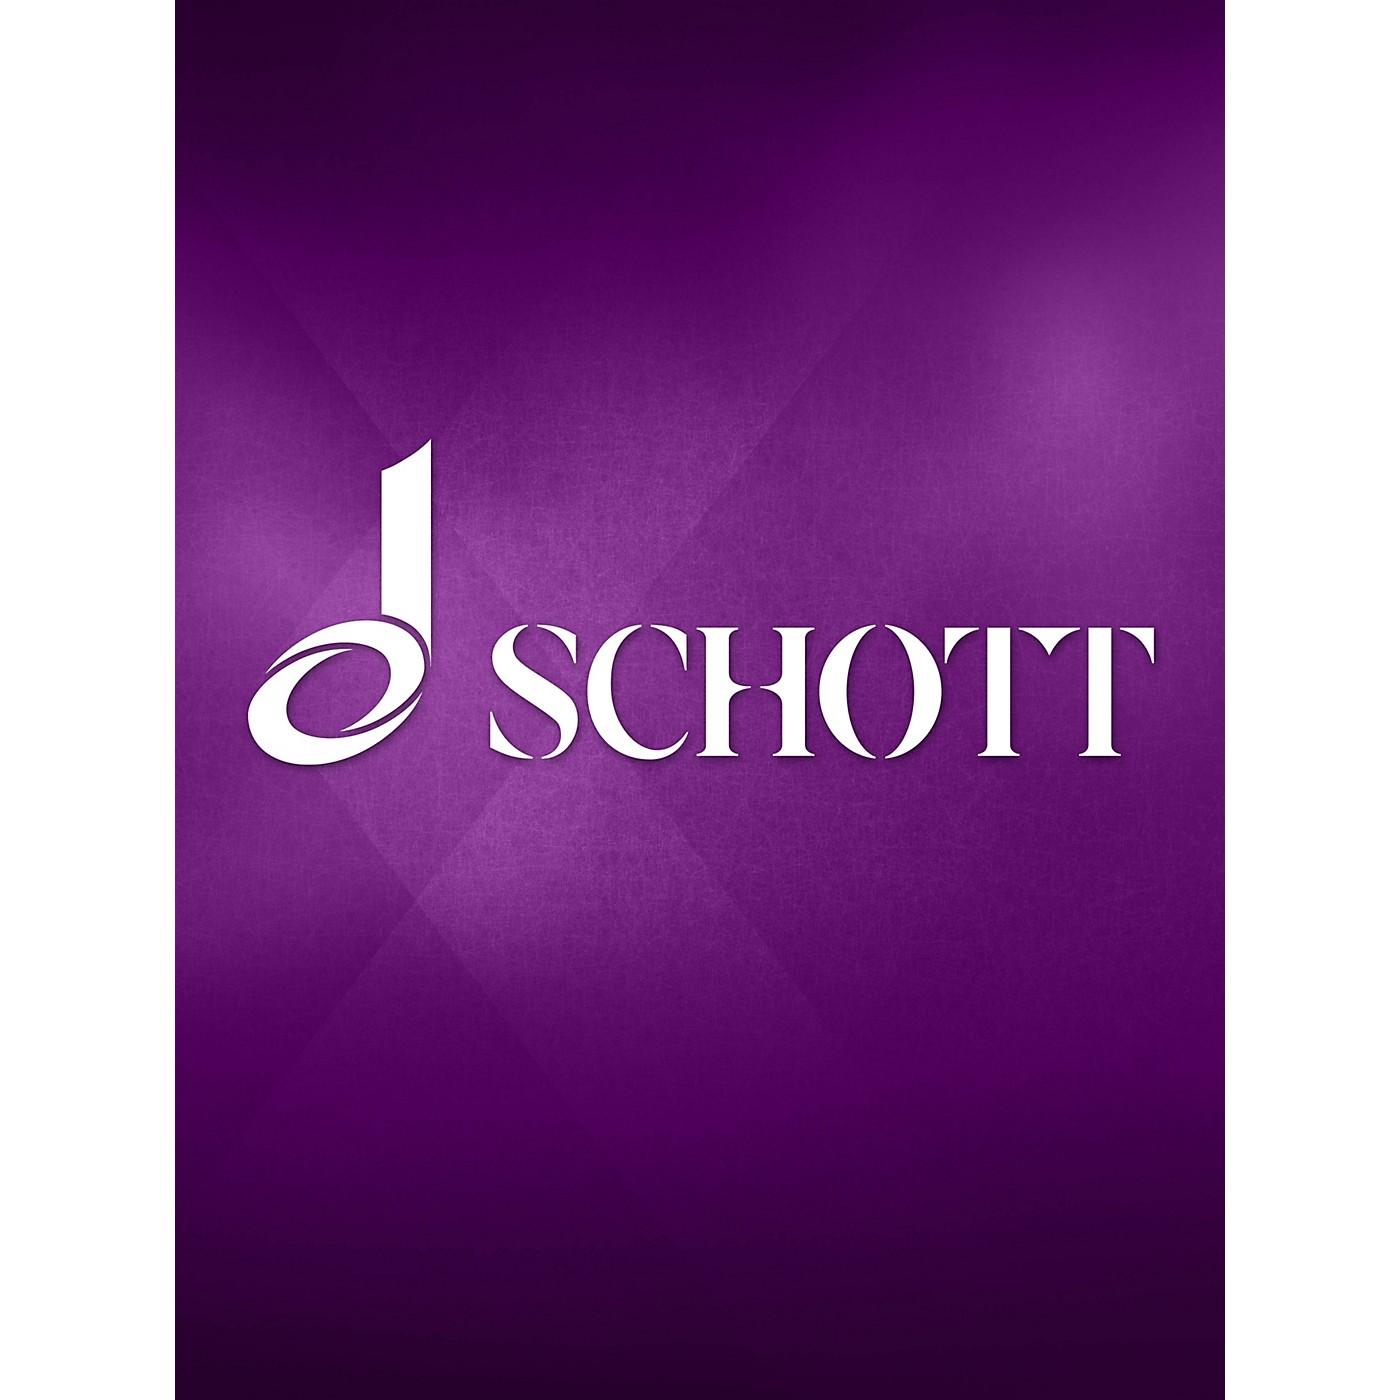 Hal Leonard A Family Likeness For Recorder Sextett (tr Tr T T B B) Score Woodwind Ensemble Series thumbnail